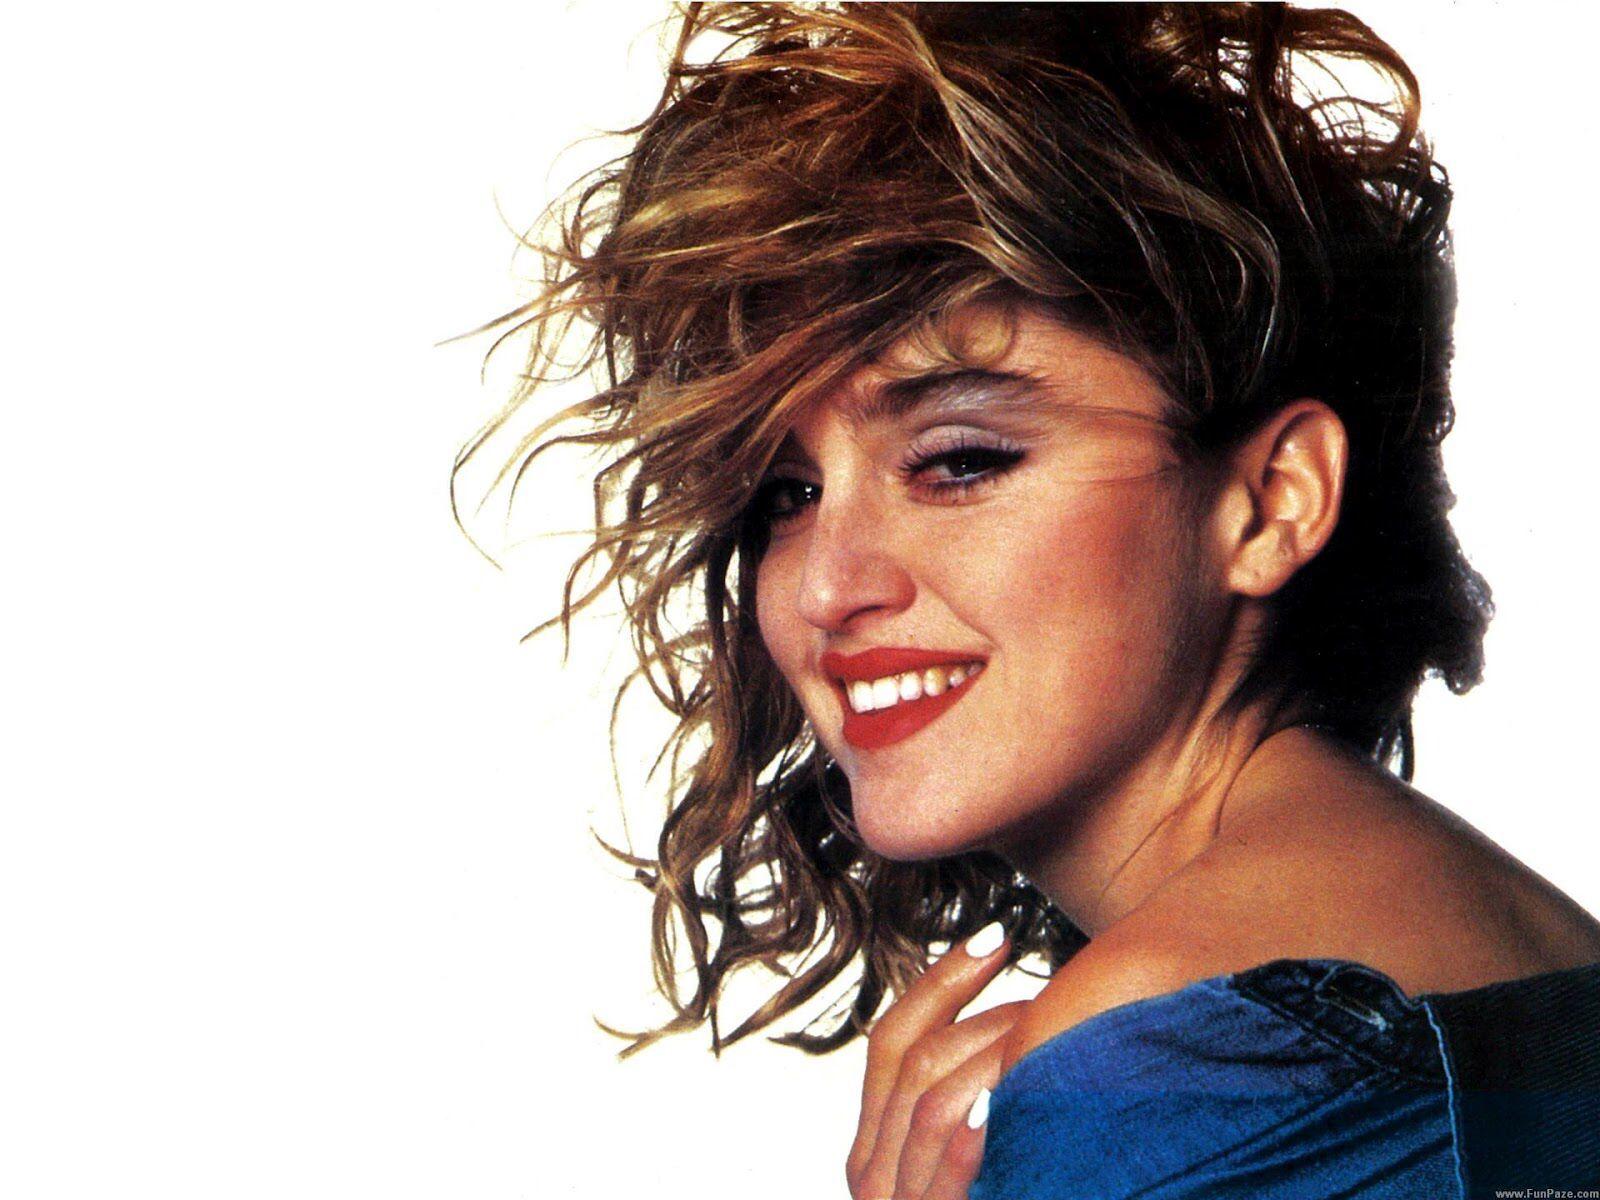 Image Issue Du Site Web Http 1 Bp Blogspot Com Umnkwm4a7vo T7peevh4zyi Aaaaaaaaf6i Fgbi82ev2g8 S1600 Madonna Hd W Madonna Images Madonna Young Madonna Sorry